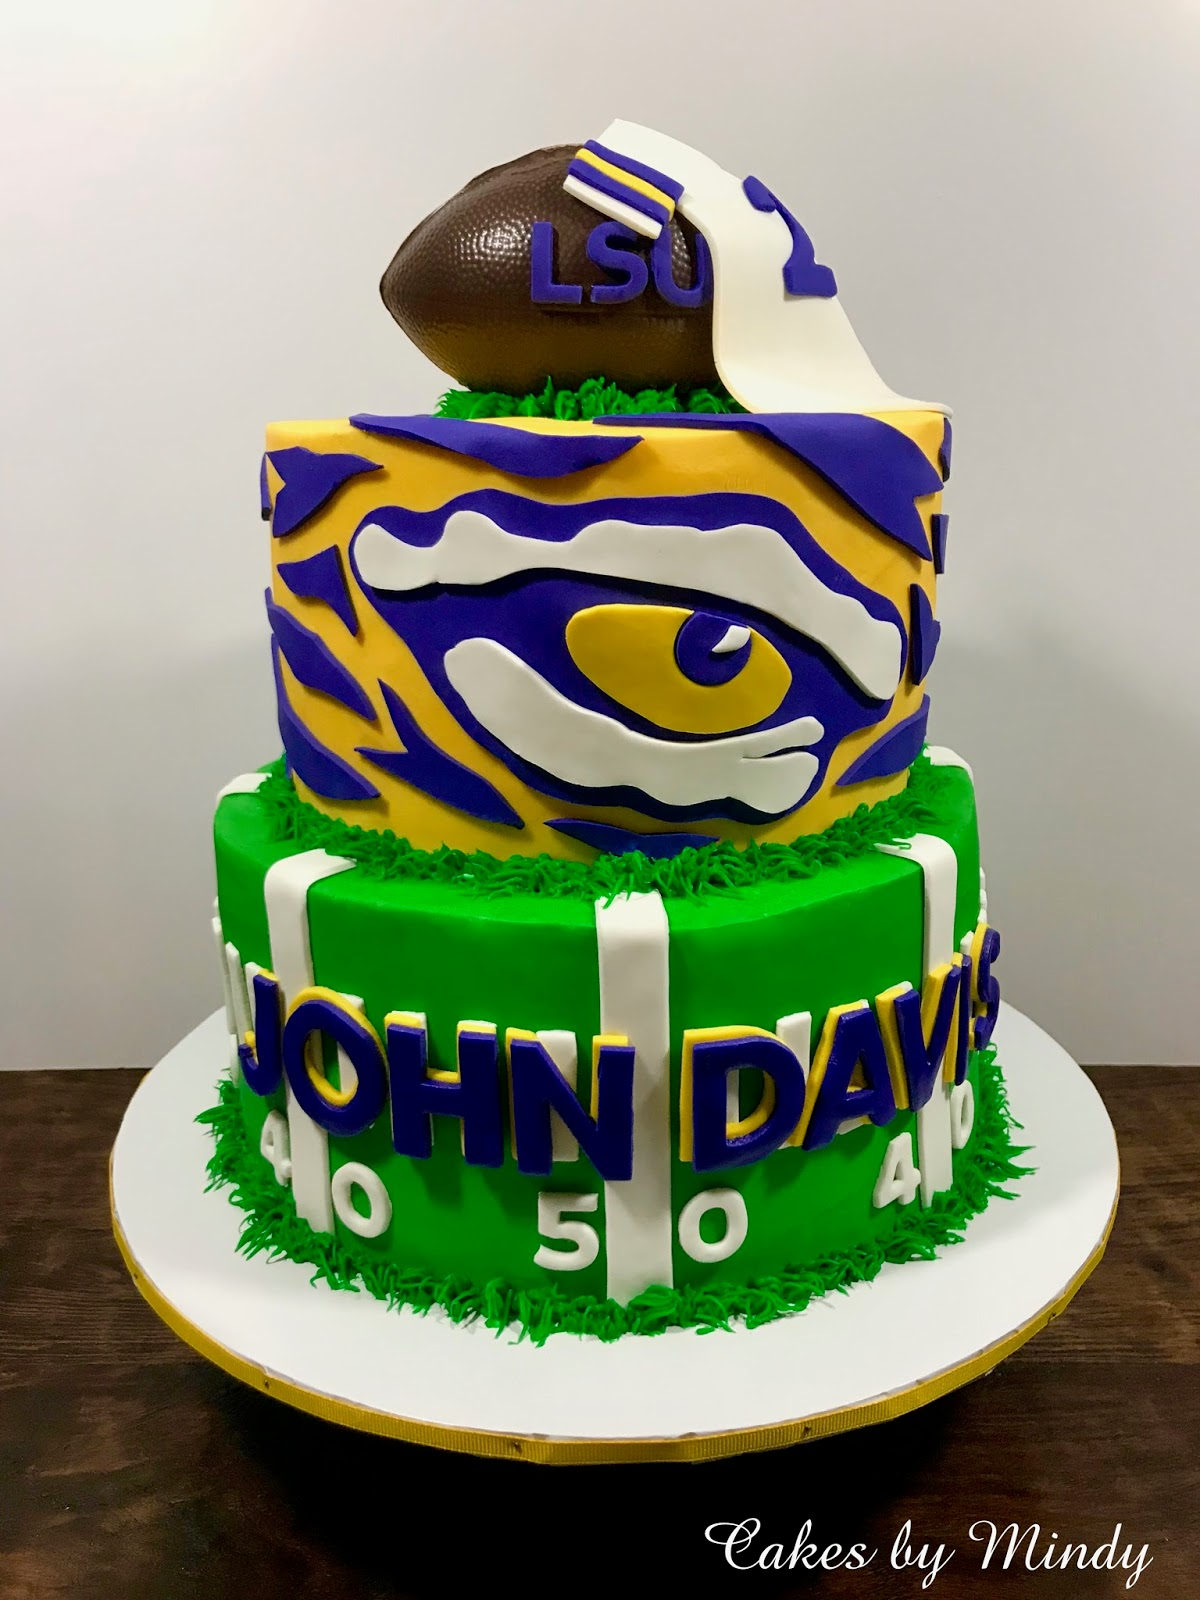 Miraculous Cakes By Mindy Lsu Tigers Birthday Cake 8 10 Funny Birthday Cards Online Necthendildamsfinfo